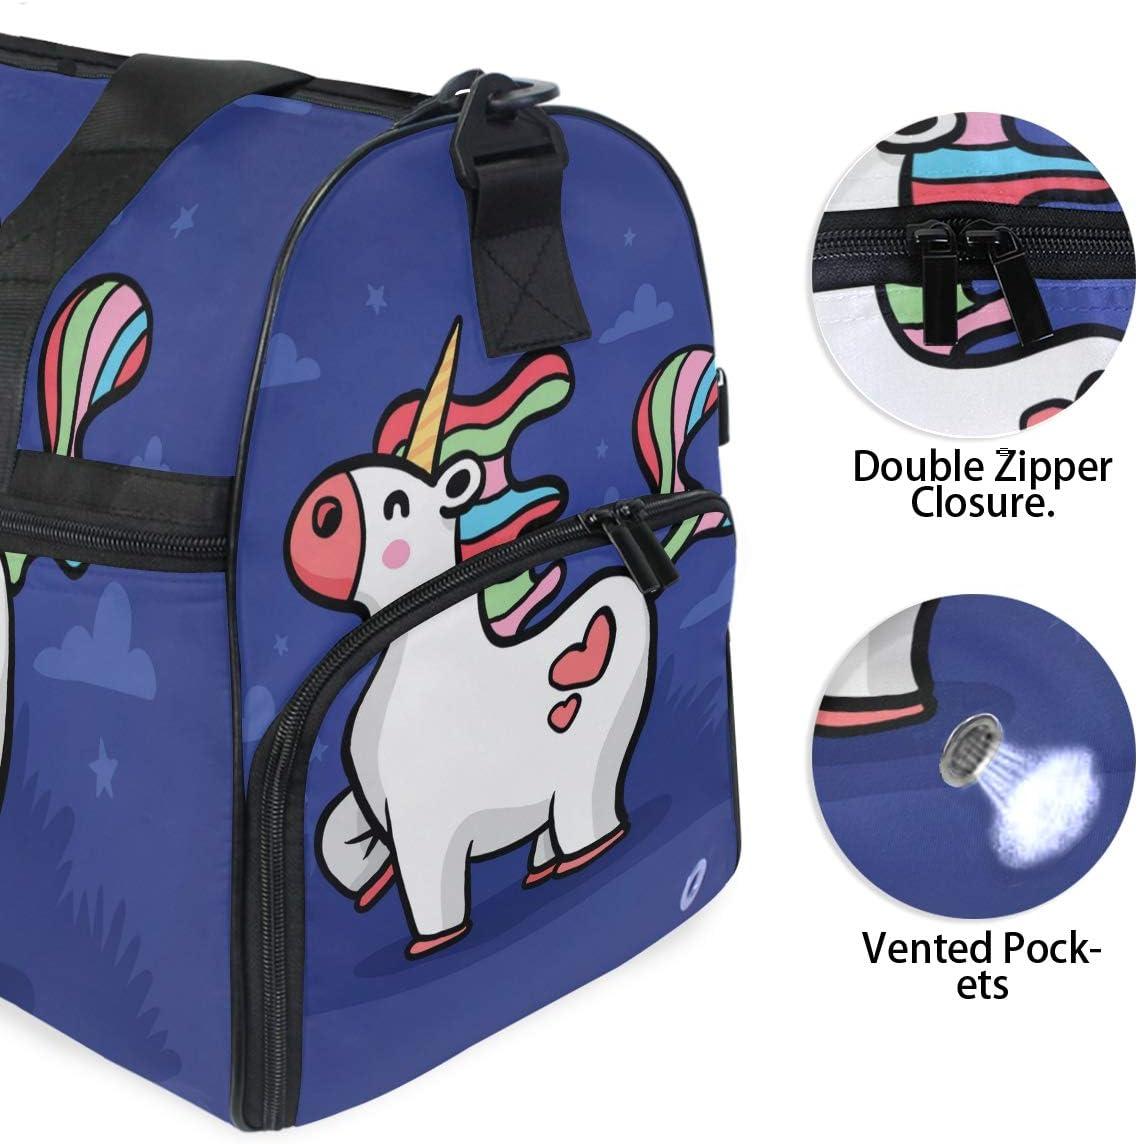 Travel Duffels Smile Unicorn Duffle Bag Luggage Sports Gym for Women /& Men